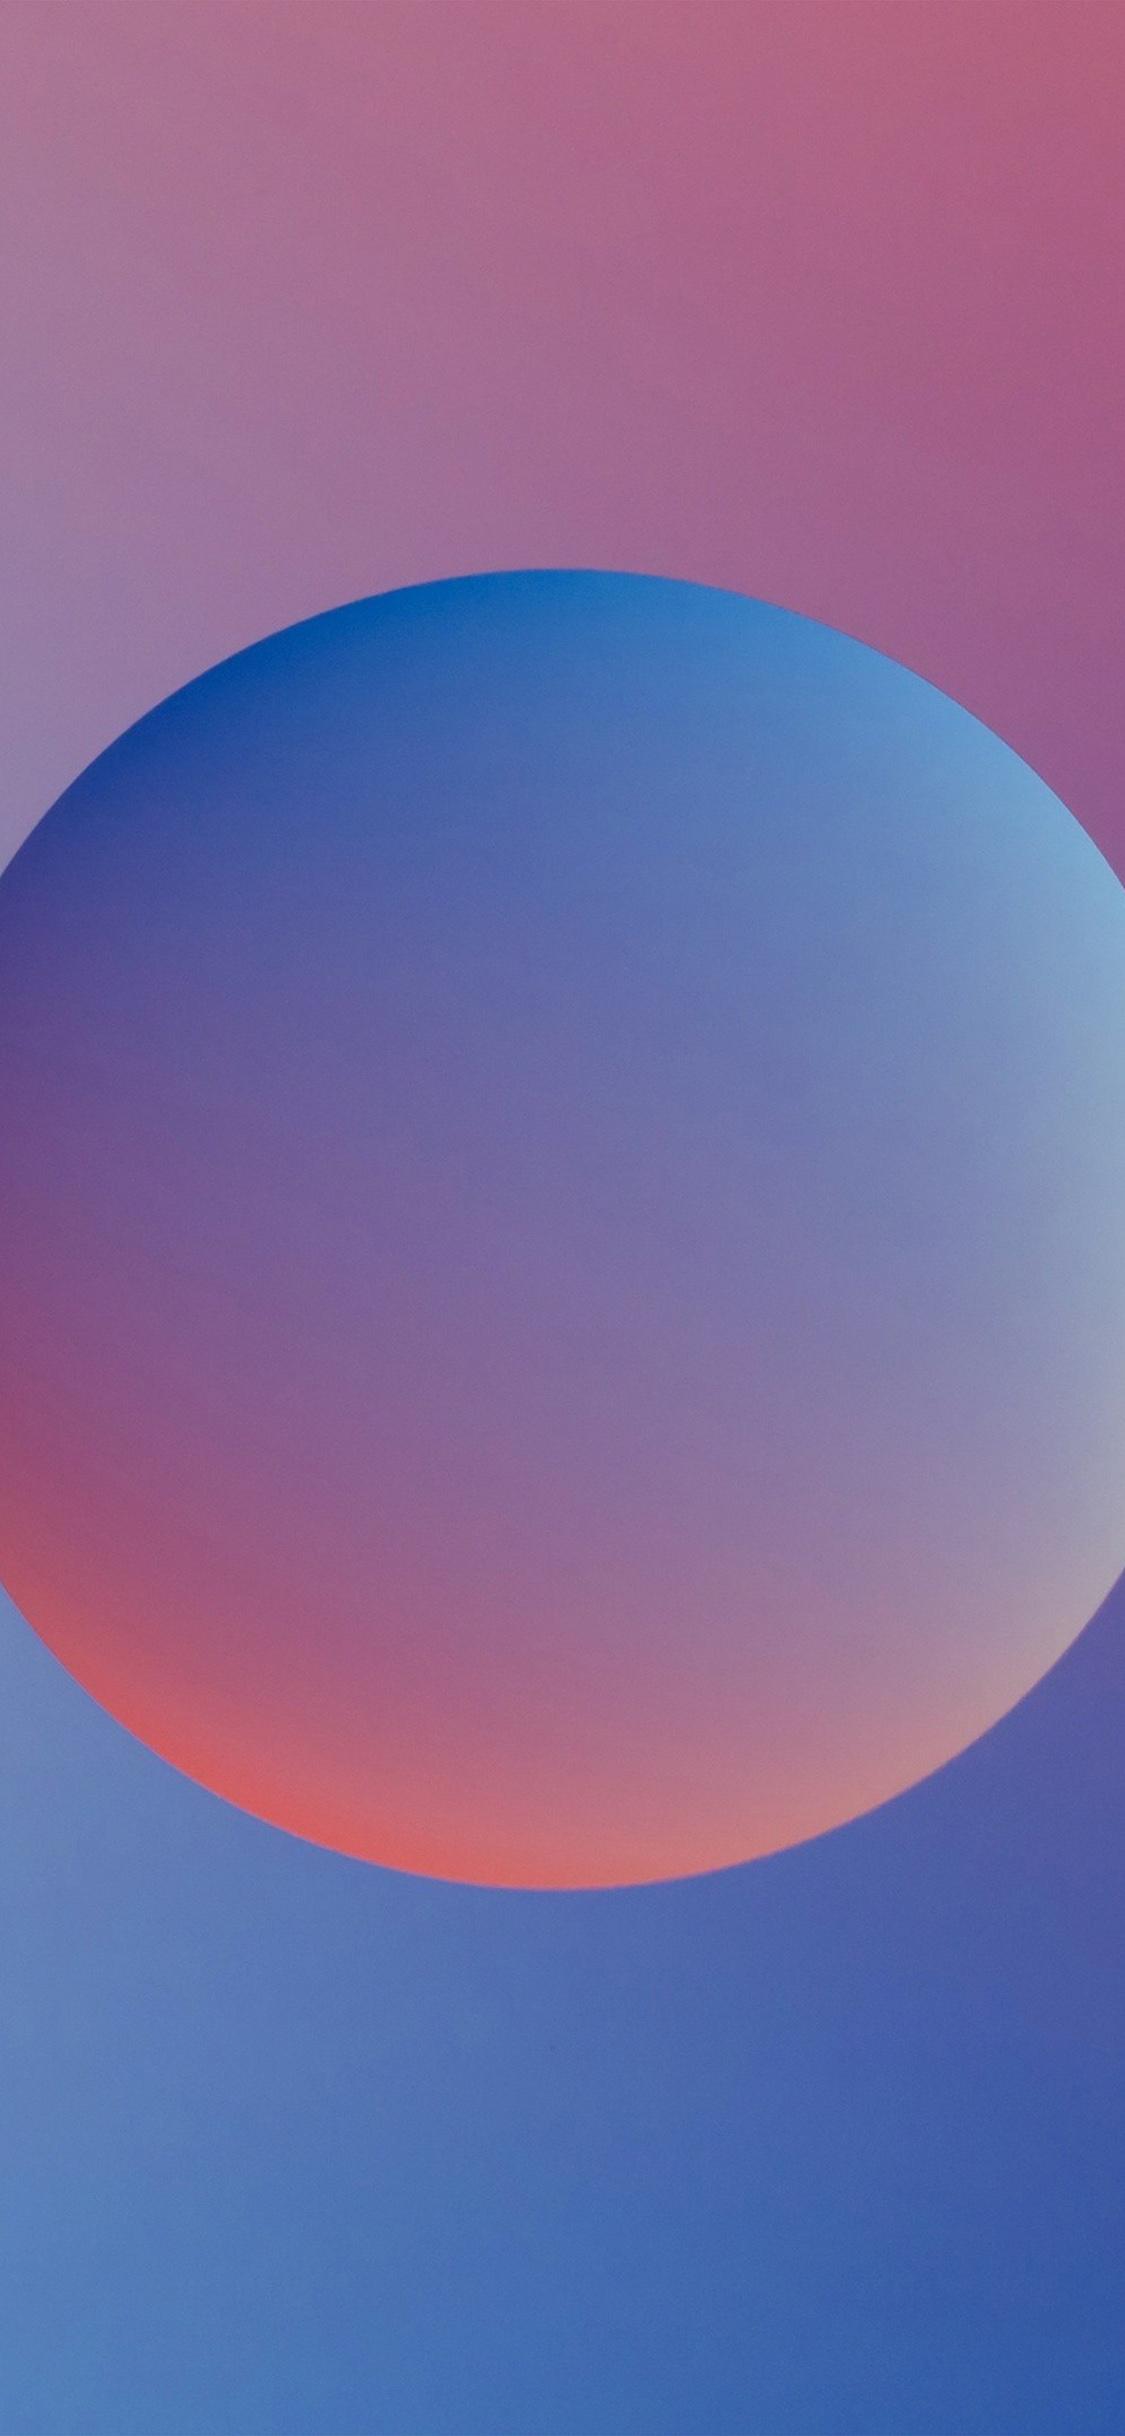 iPhoneXpapers.com-Apple-iPhone-wallpaper-ax56-minimal-ball-gradation-red-blue-illustration-art